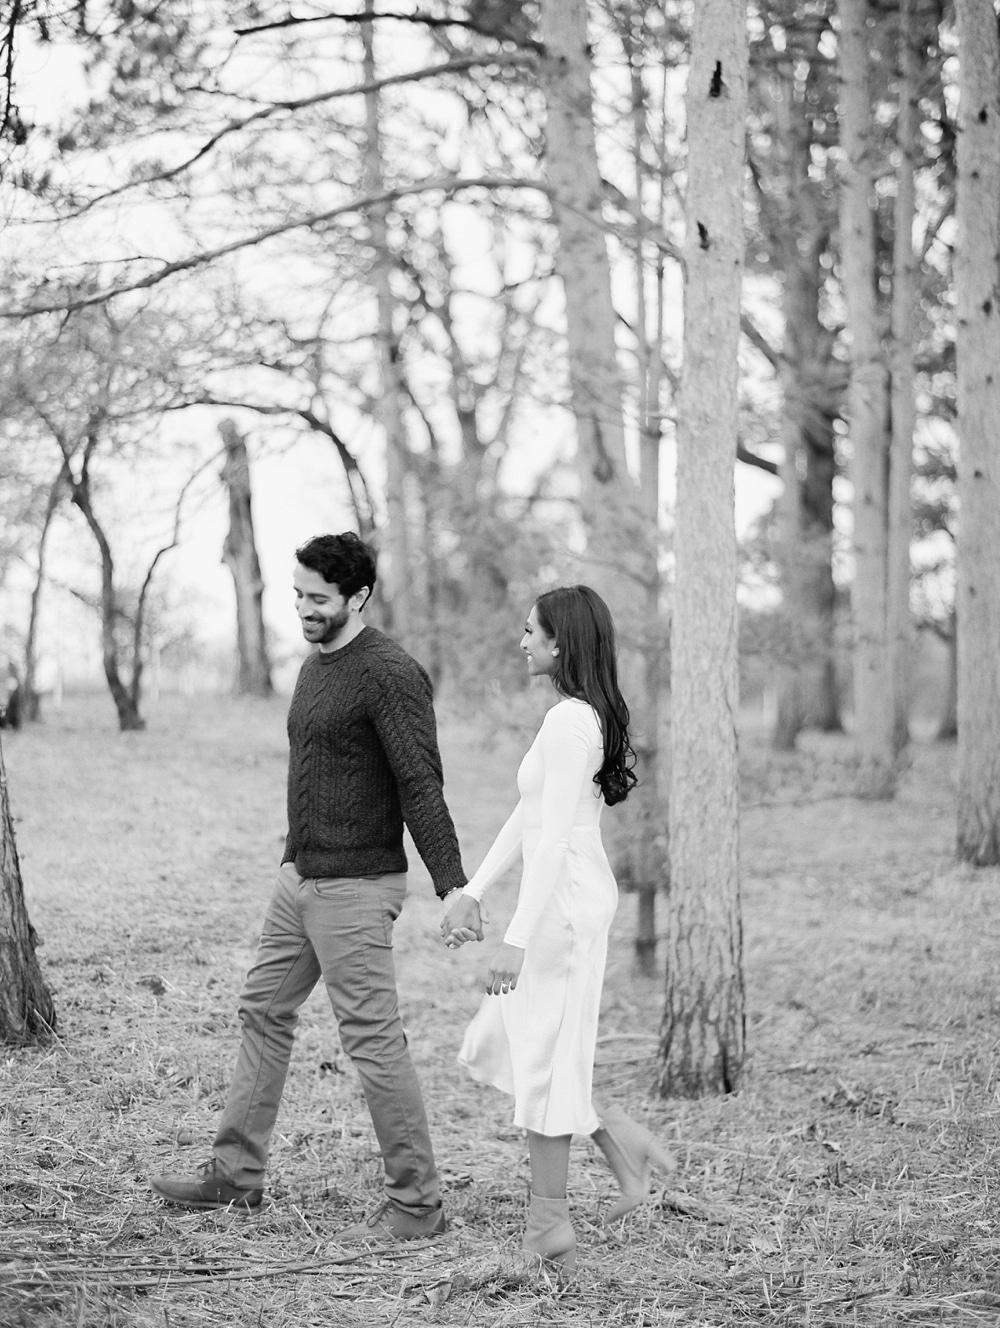 Kristin-La-Voie-Photography-morton-arboretum-chicago-wedding-photographer-73